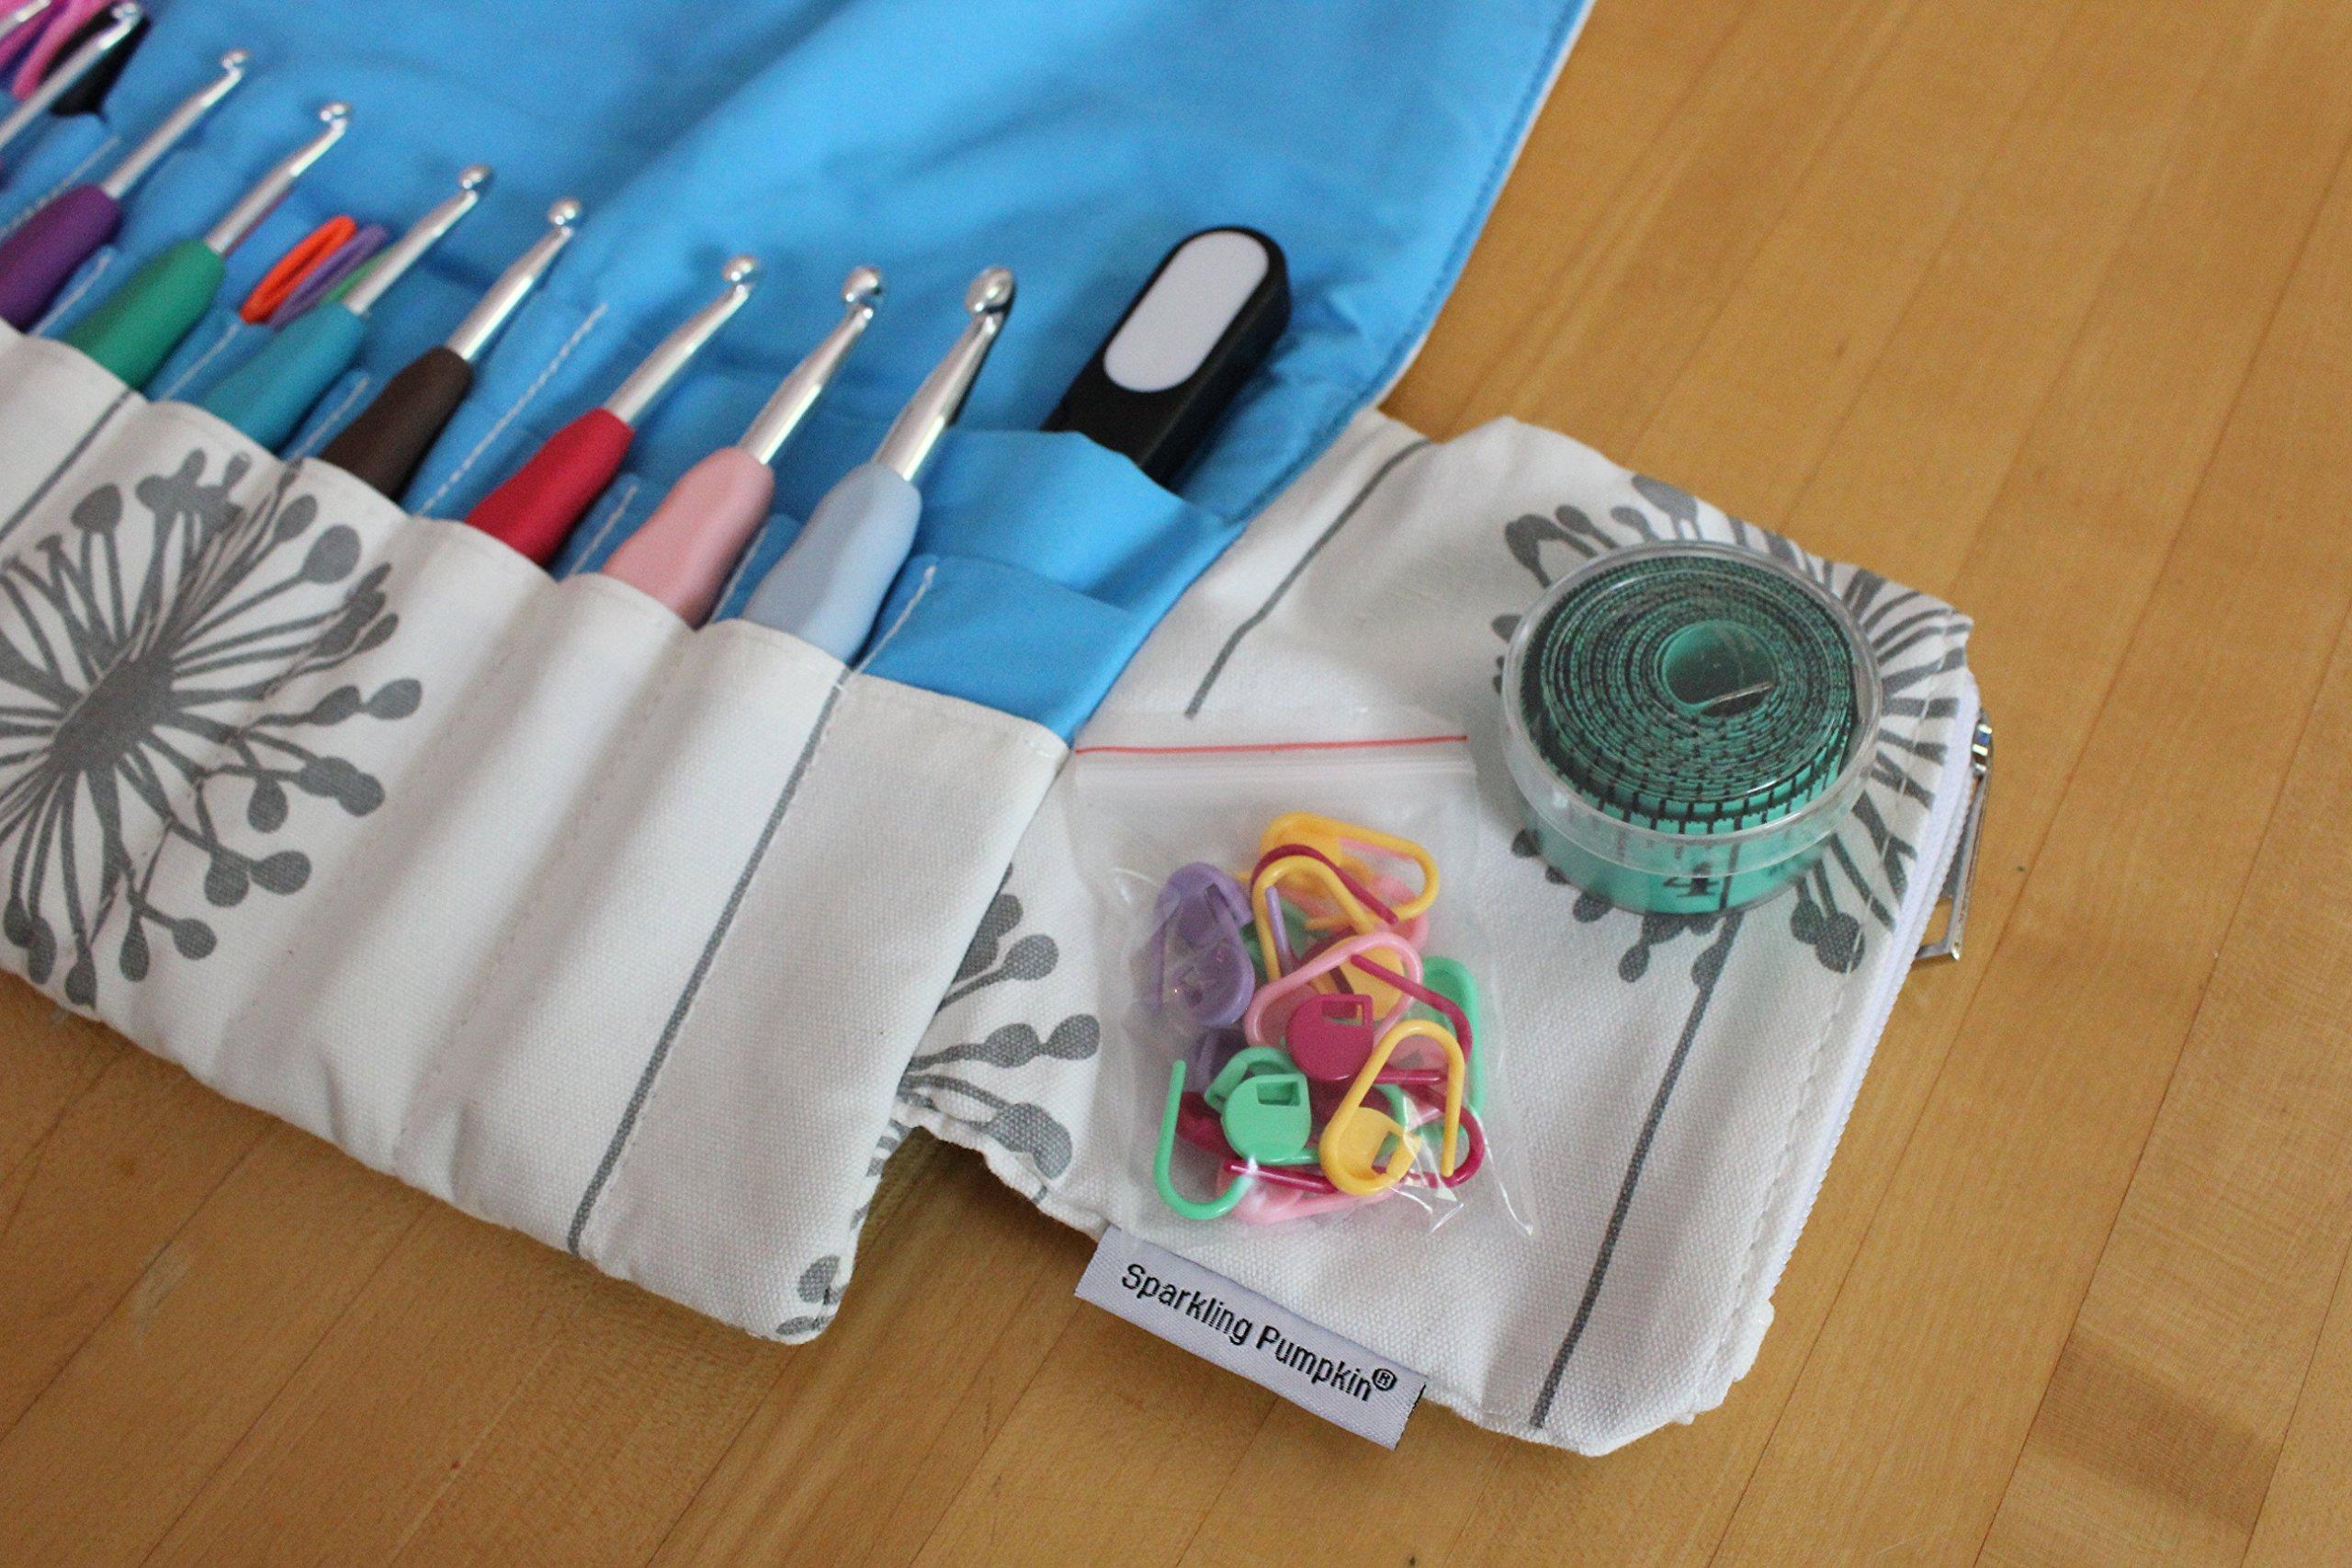 Sparkling Pumpkin Crochet Set - Ergonomic Crochet Hook Set with Multiple Accessories - Blue Dandelion Hook Case, Yarn Needles, Stitch Markers, Measuring Tape & More! (38 Piece Set, Dandelion)